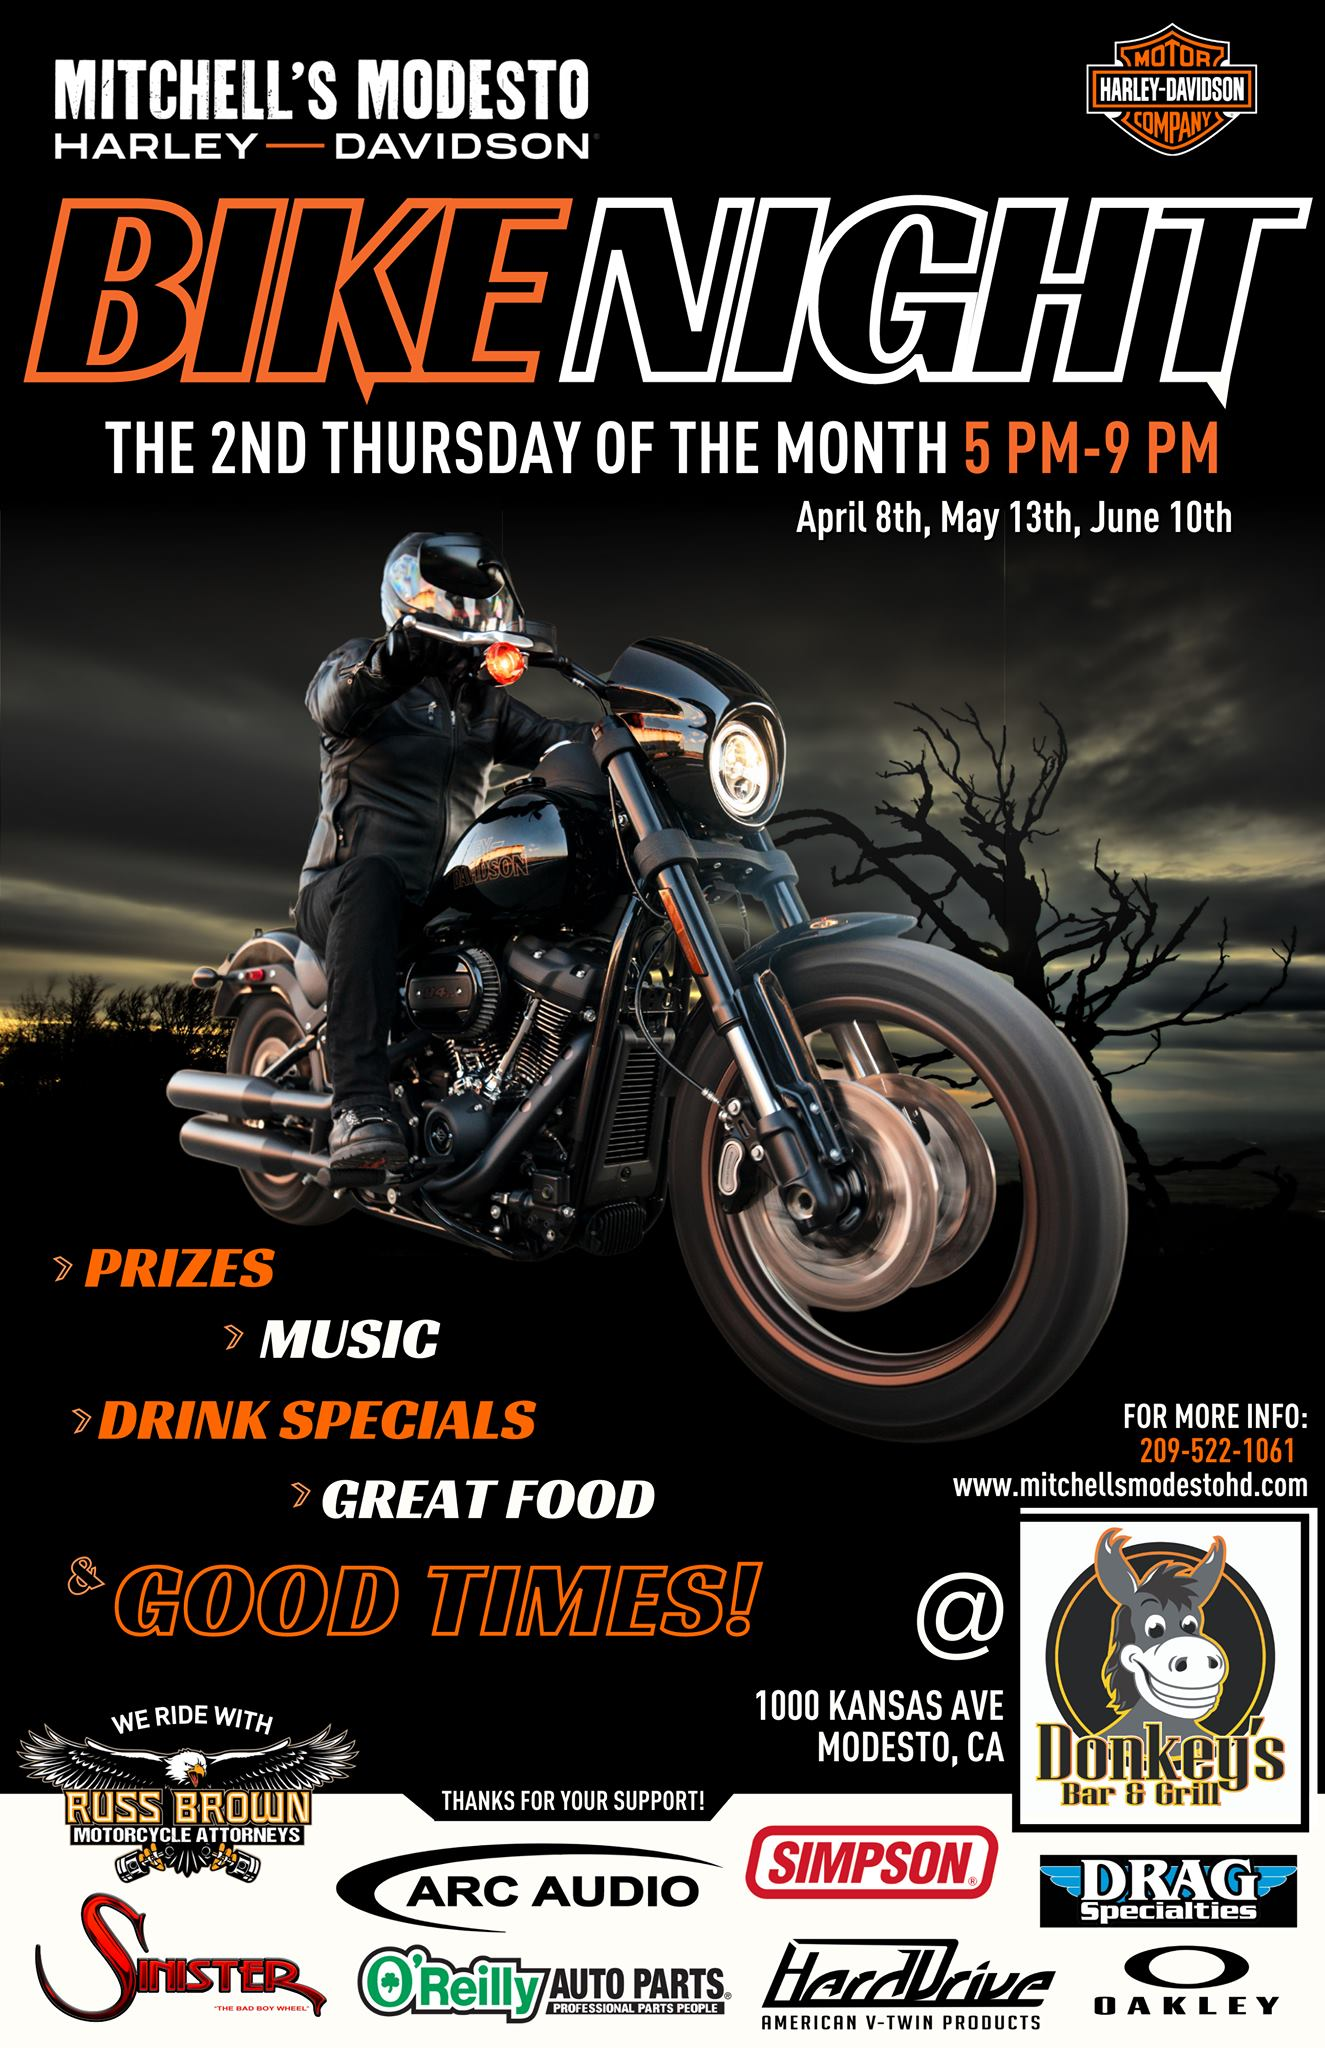 Mitchell's Modesto Harley-Davidson Bike Night